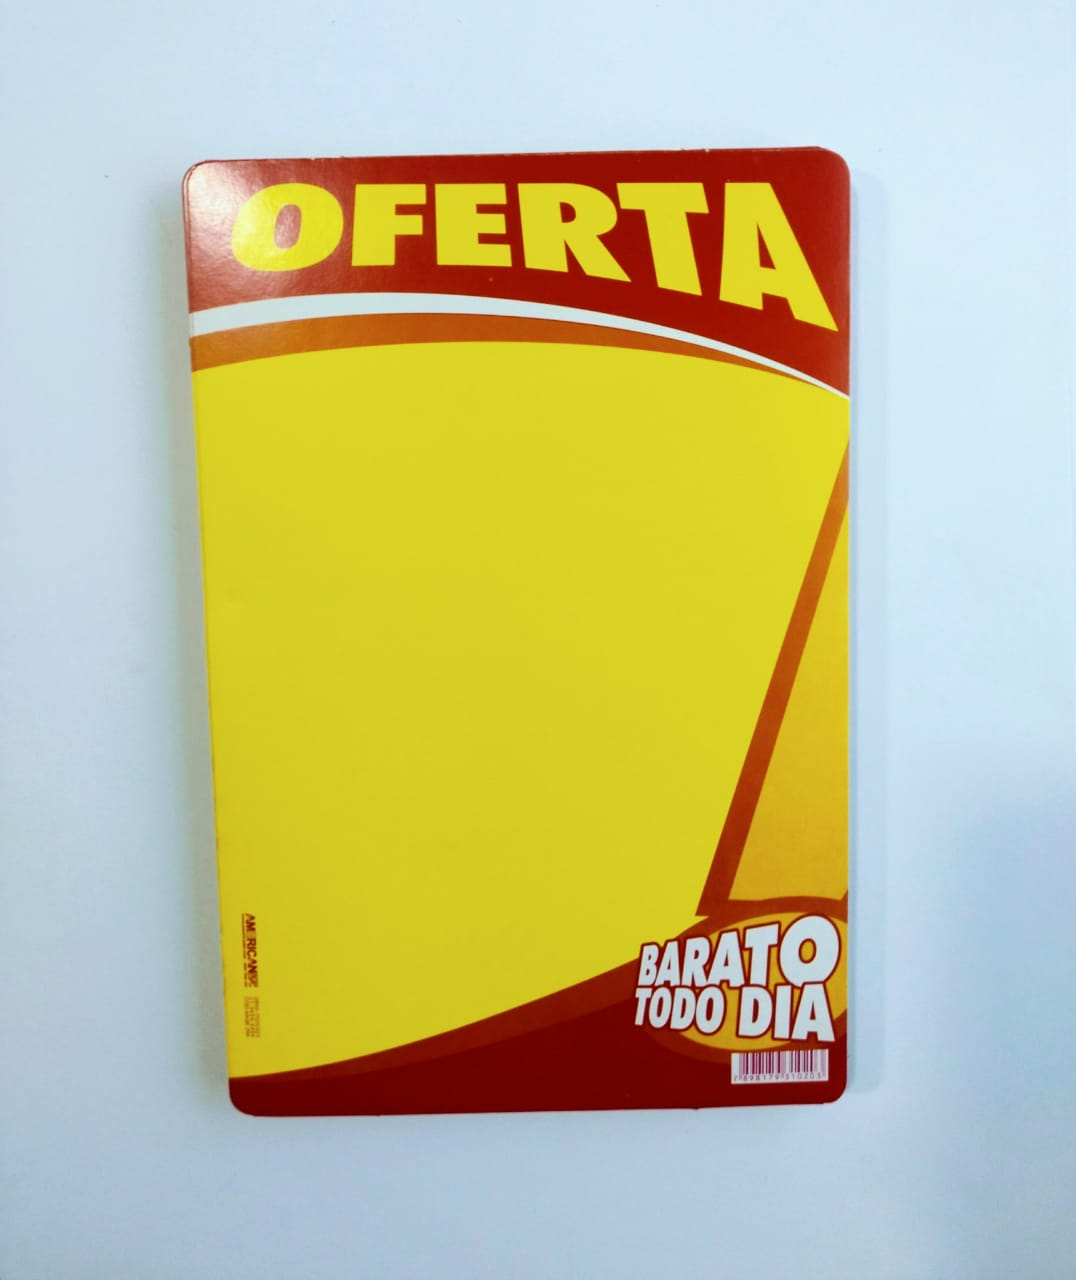 CARTAZ OFERTA BARATO TODO DIA 20X30CM (C/50 UNIDADES)